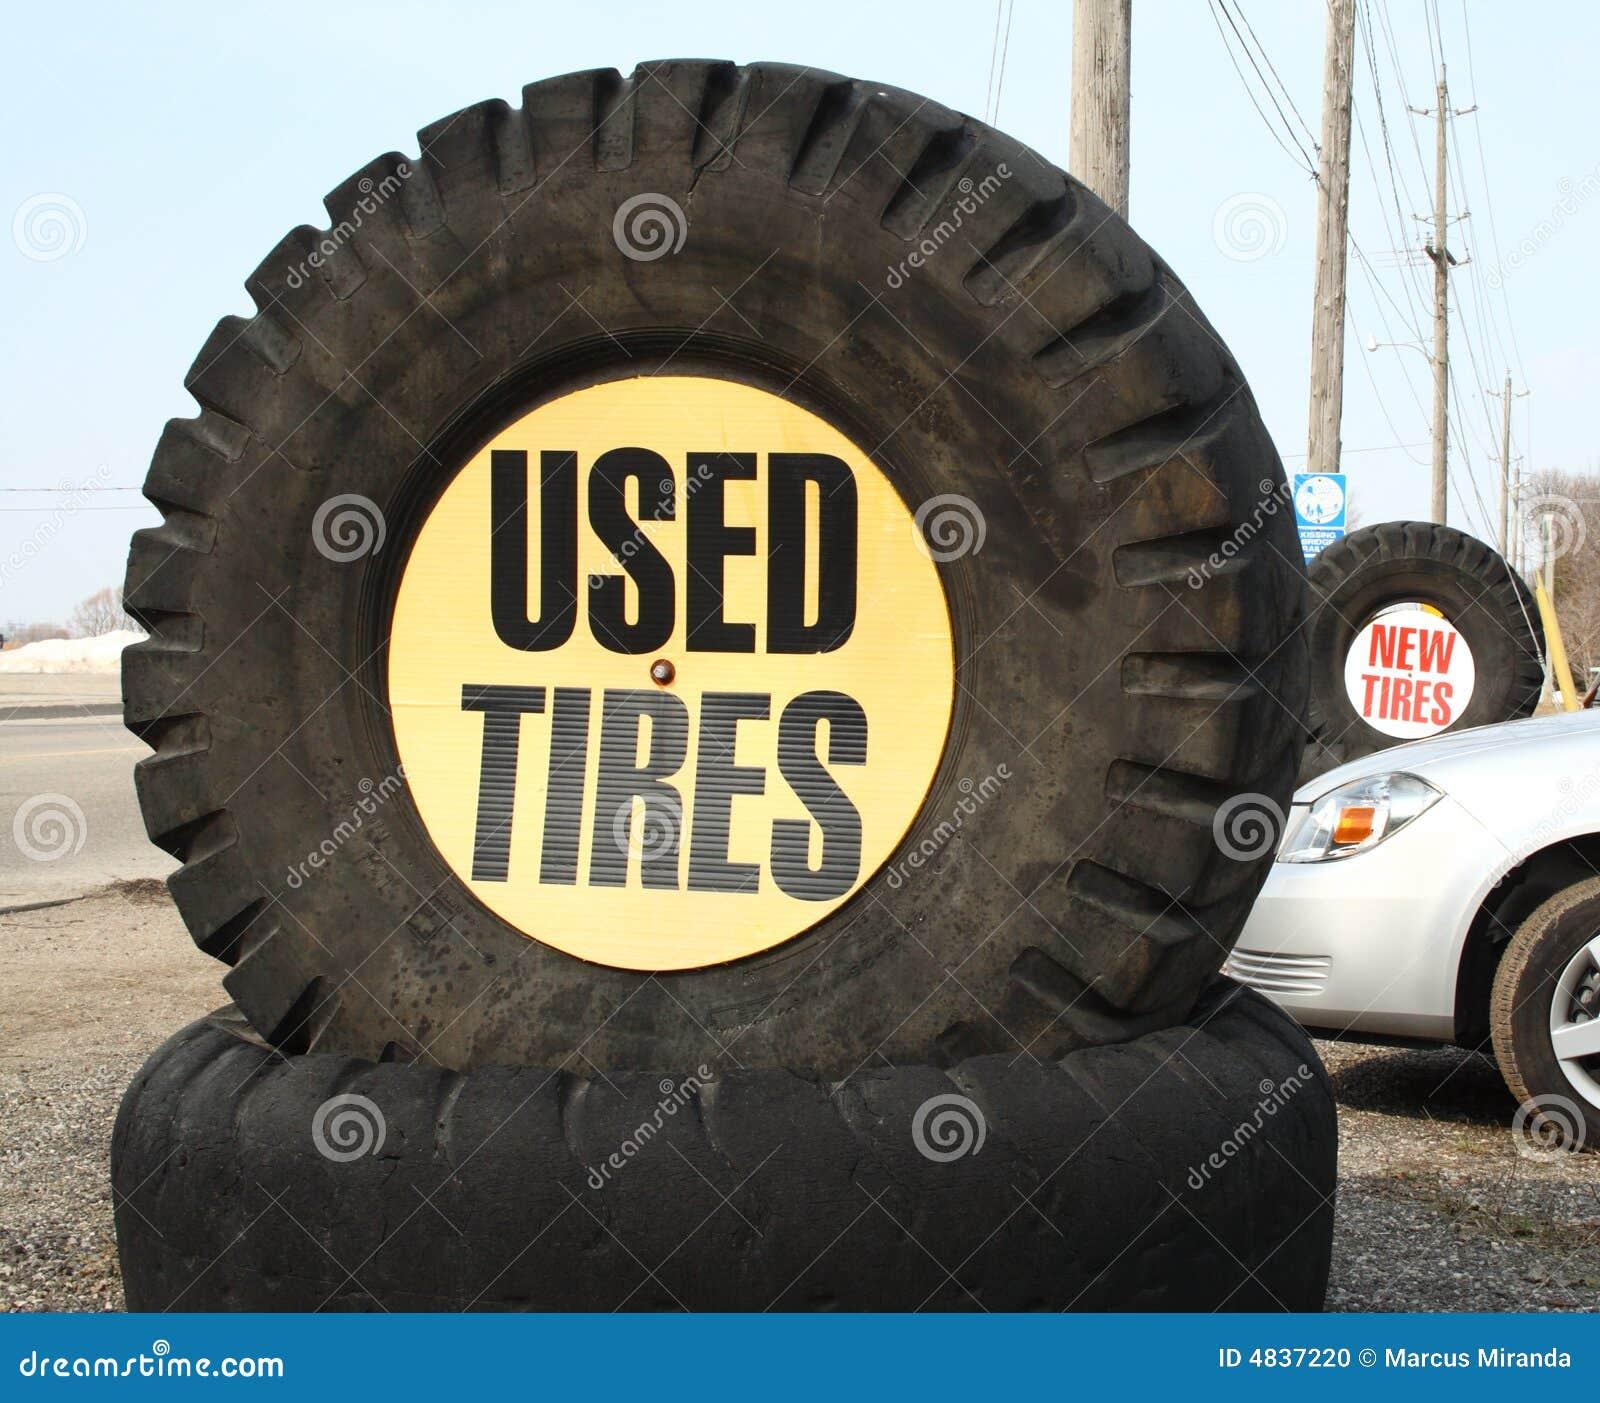 used tires stock photo image of worn transportation 4837220. Black Bedroom Furniture Sets. Home Design Ideas